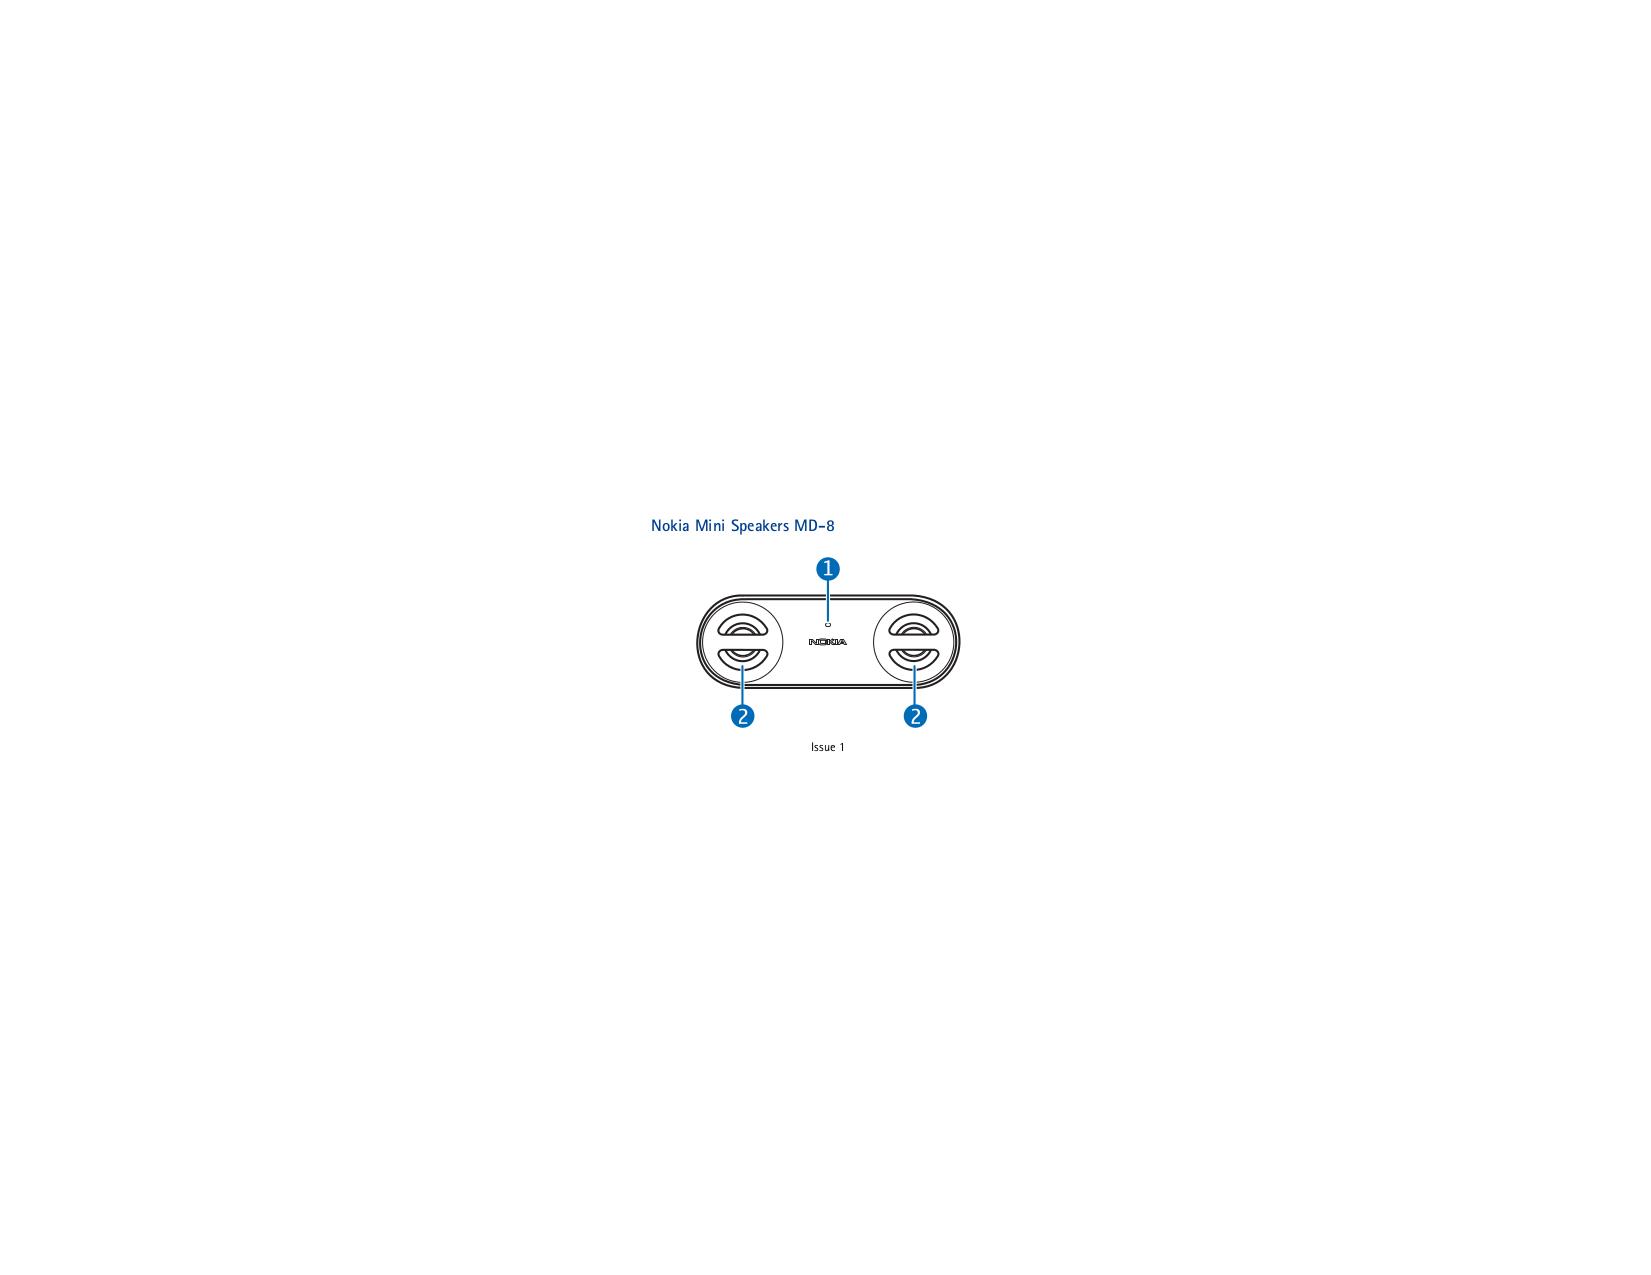 pdf for Nokia Speaker MD-8 manual